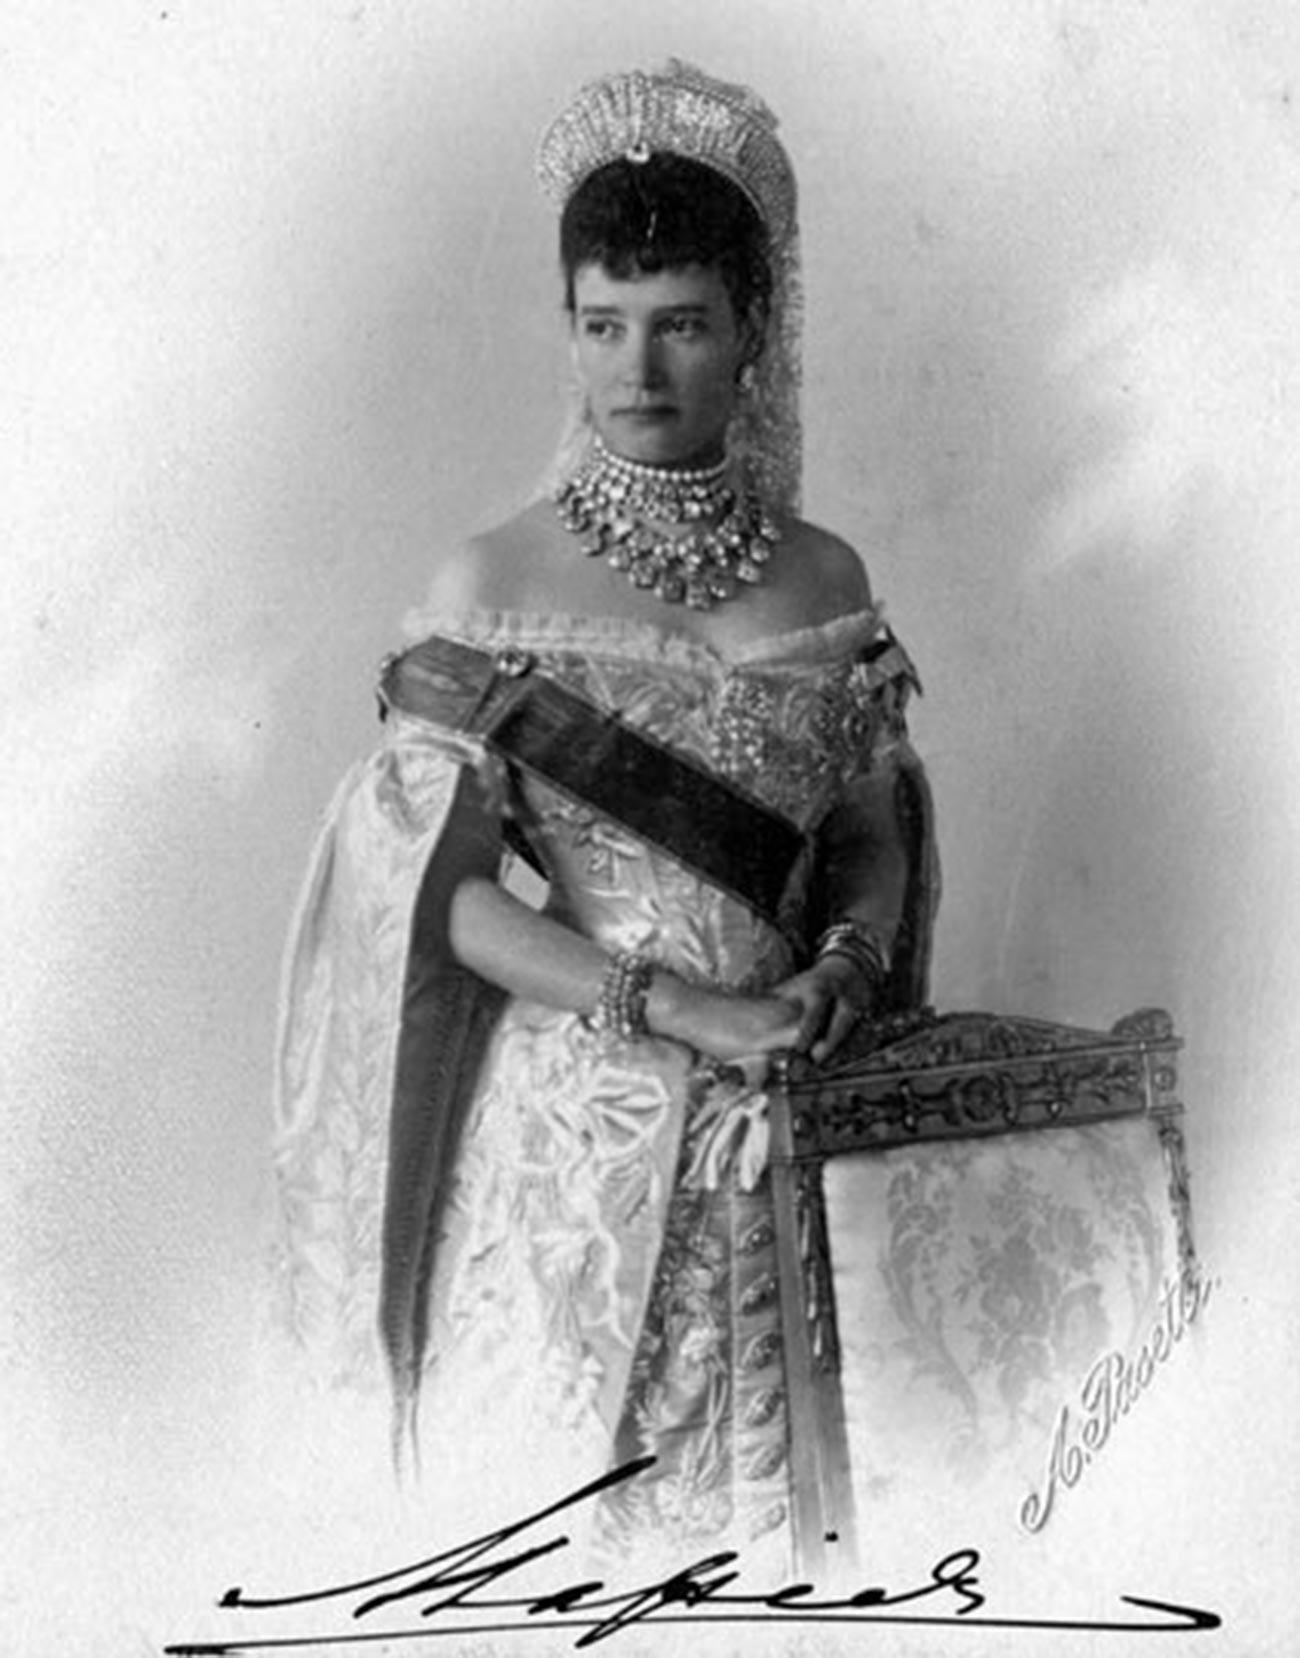 Imperatriz Maria Feodorovna (Dagmar da Dinamarca, 1847-1928)